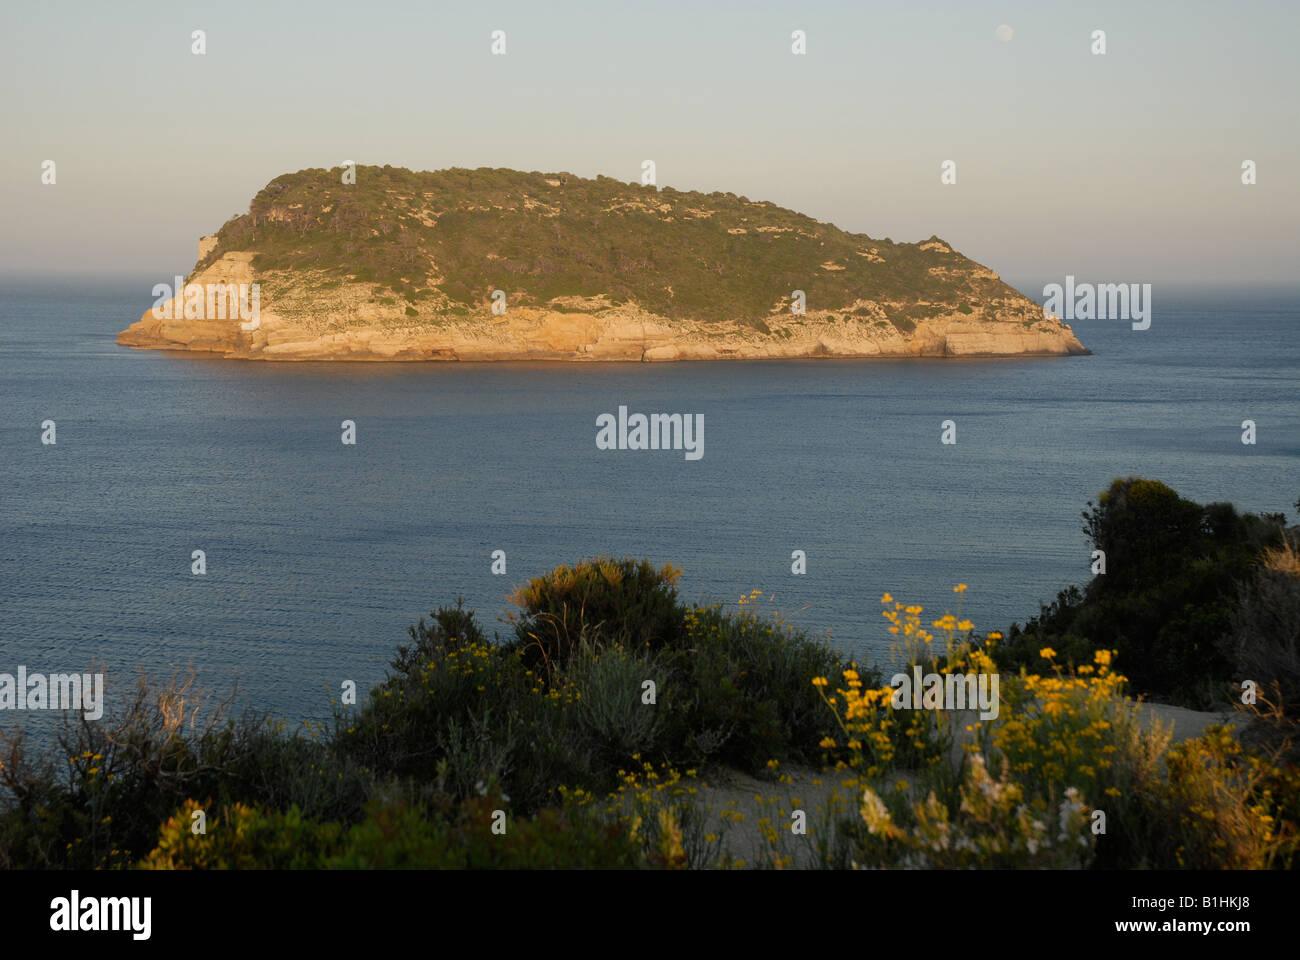 view from Cabo de San Martin to Portichol Island, Javea, Alicante Province, Comunidad Valenciana, Spain - Stock Image